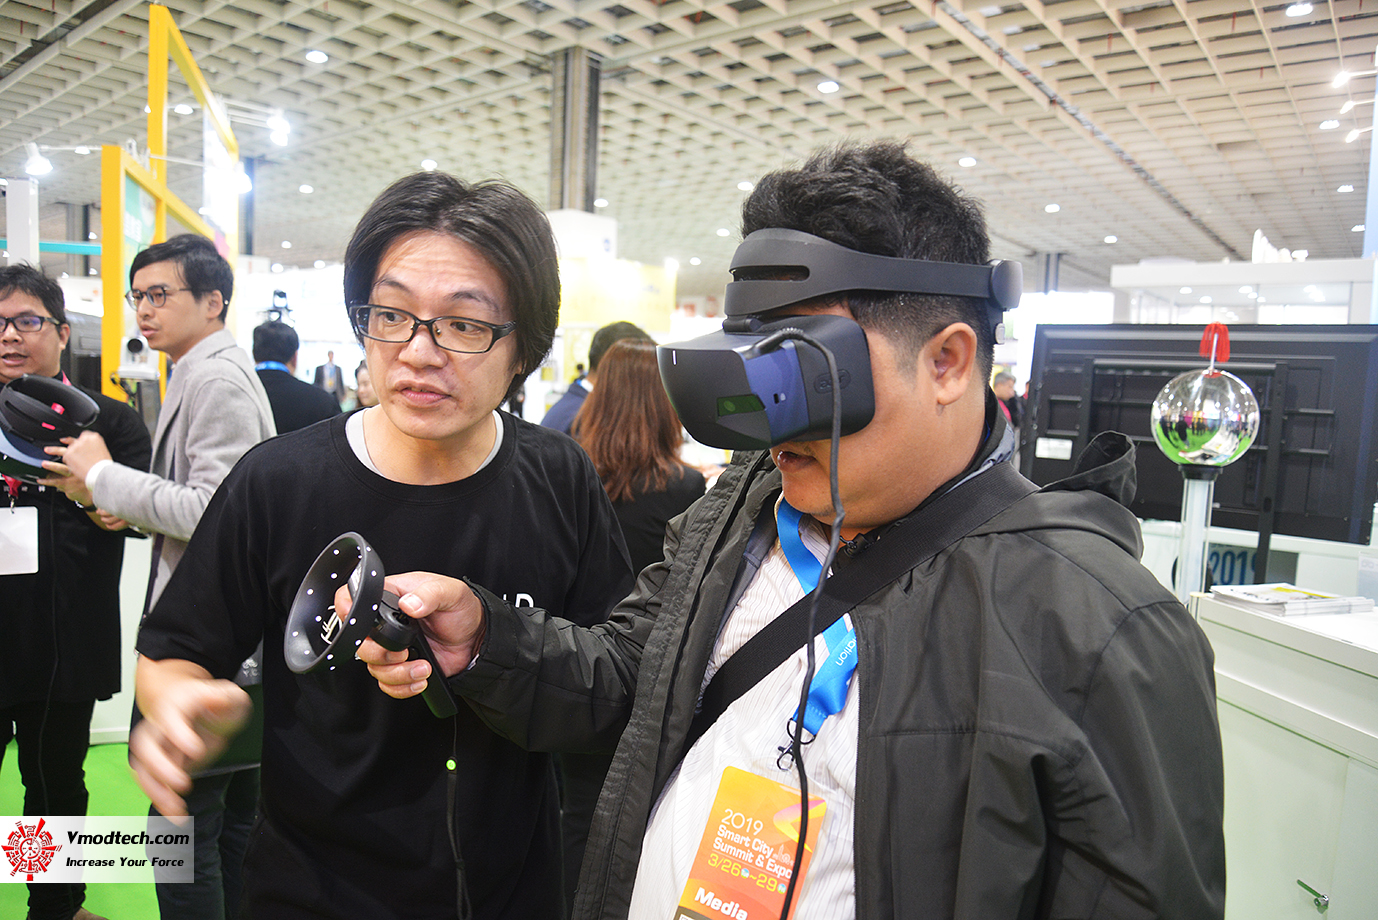 dsc 8601 เยี่ยมชมบูธ Smart Education ระบบการศึกษาอัจฉริยะในงาน 2019 SMART CITY SUMMIT & EXPO ณ กรุงไทเป ประเทศไต้หวัน